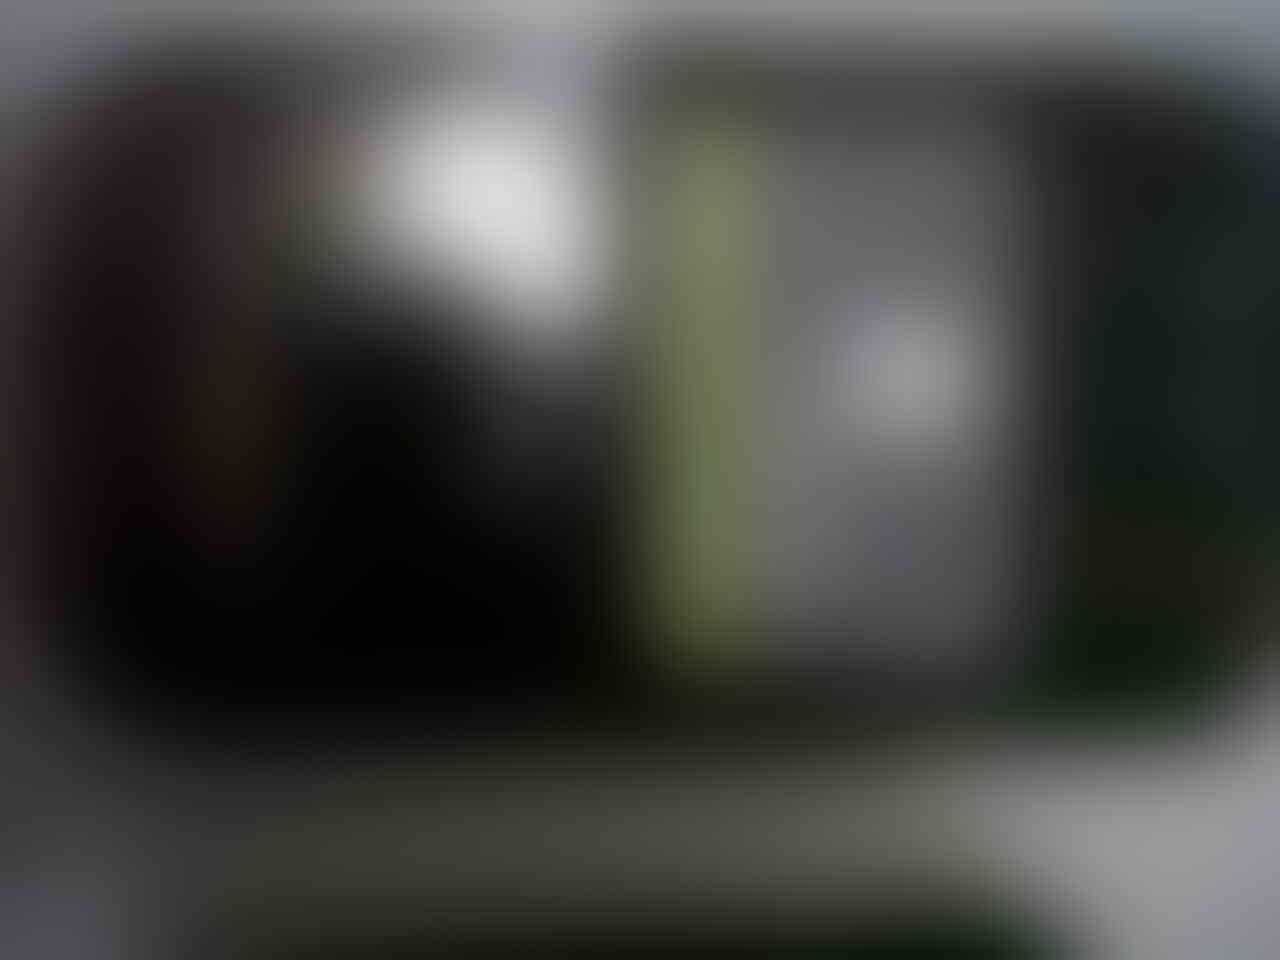 jual cepattt,blackberry tour 1(9630),lg bu